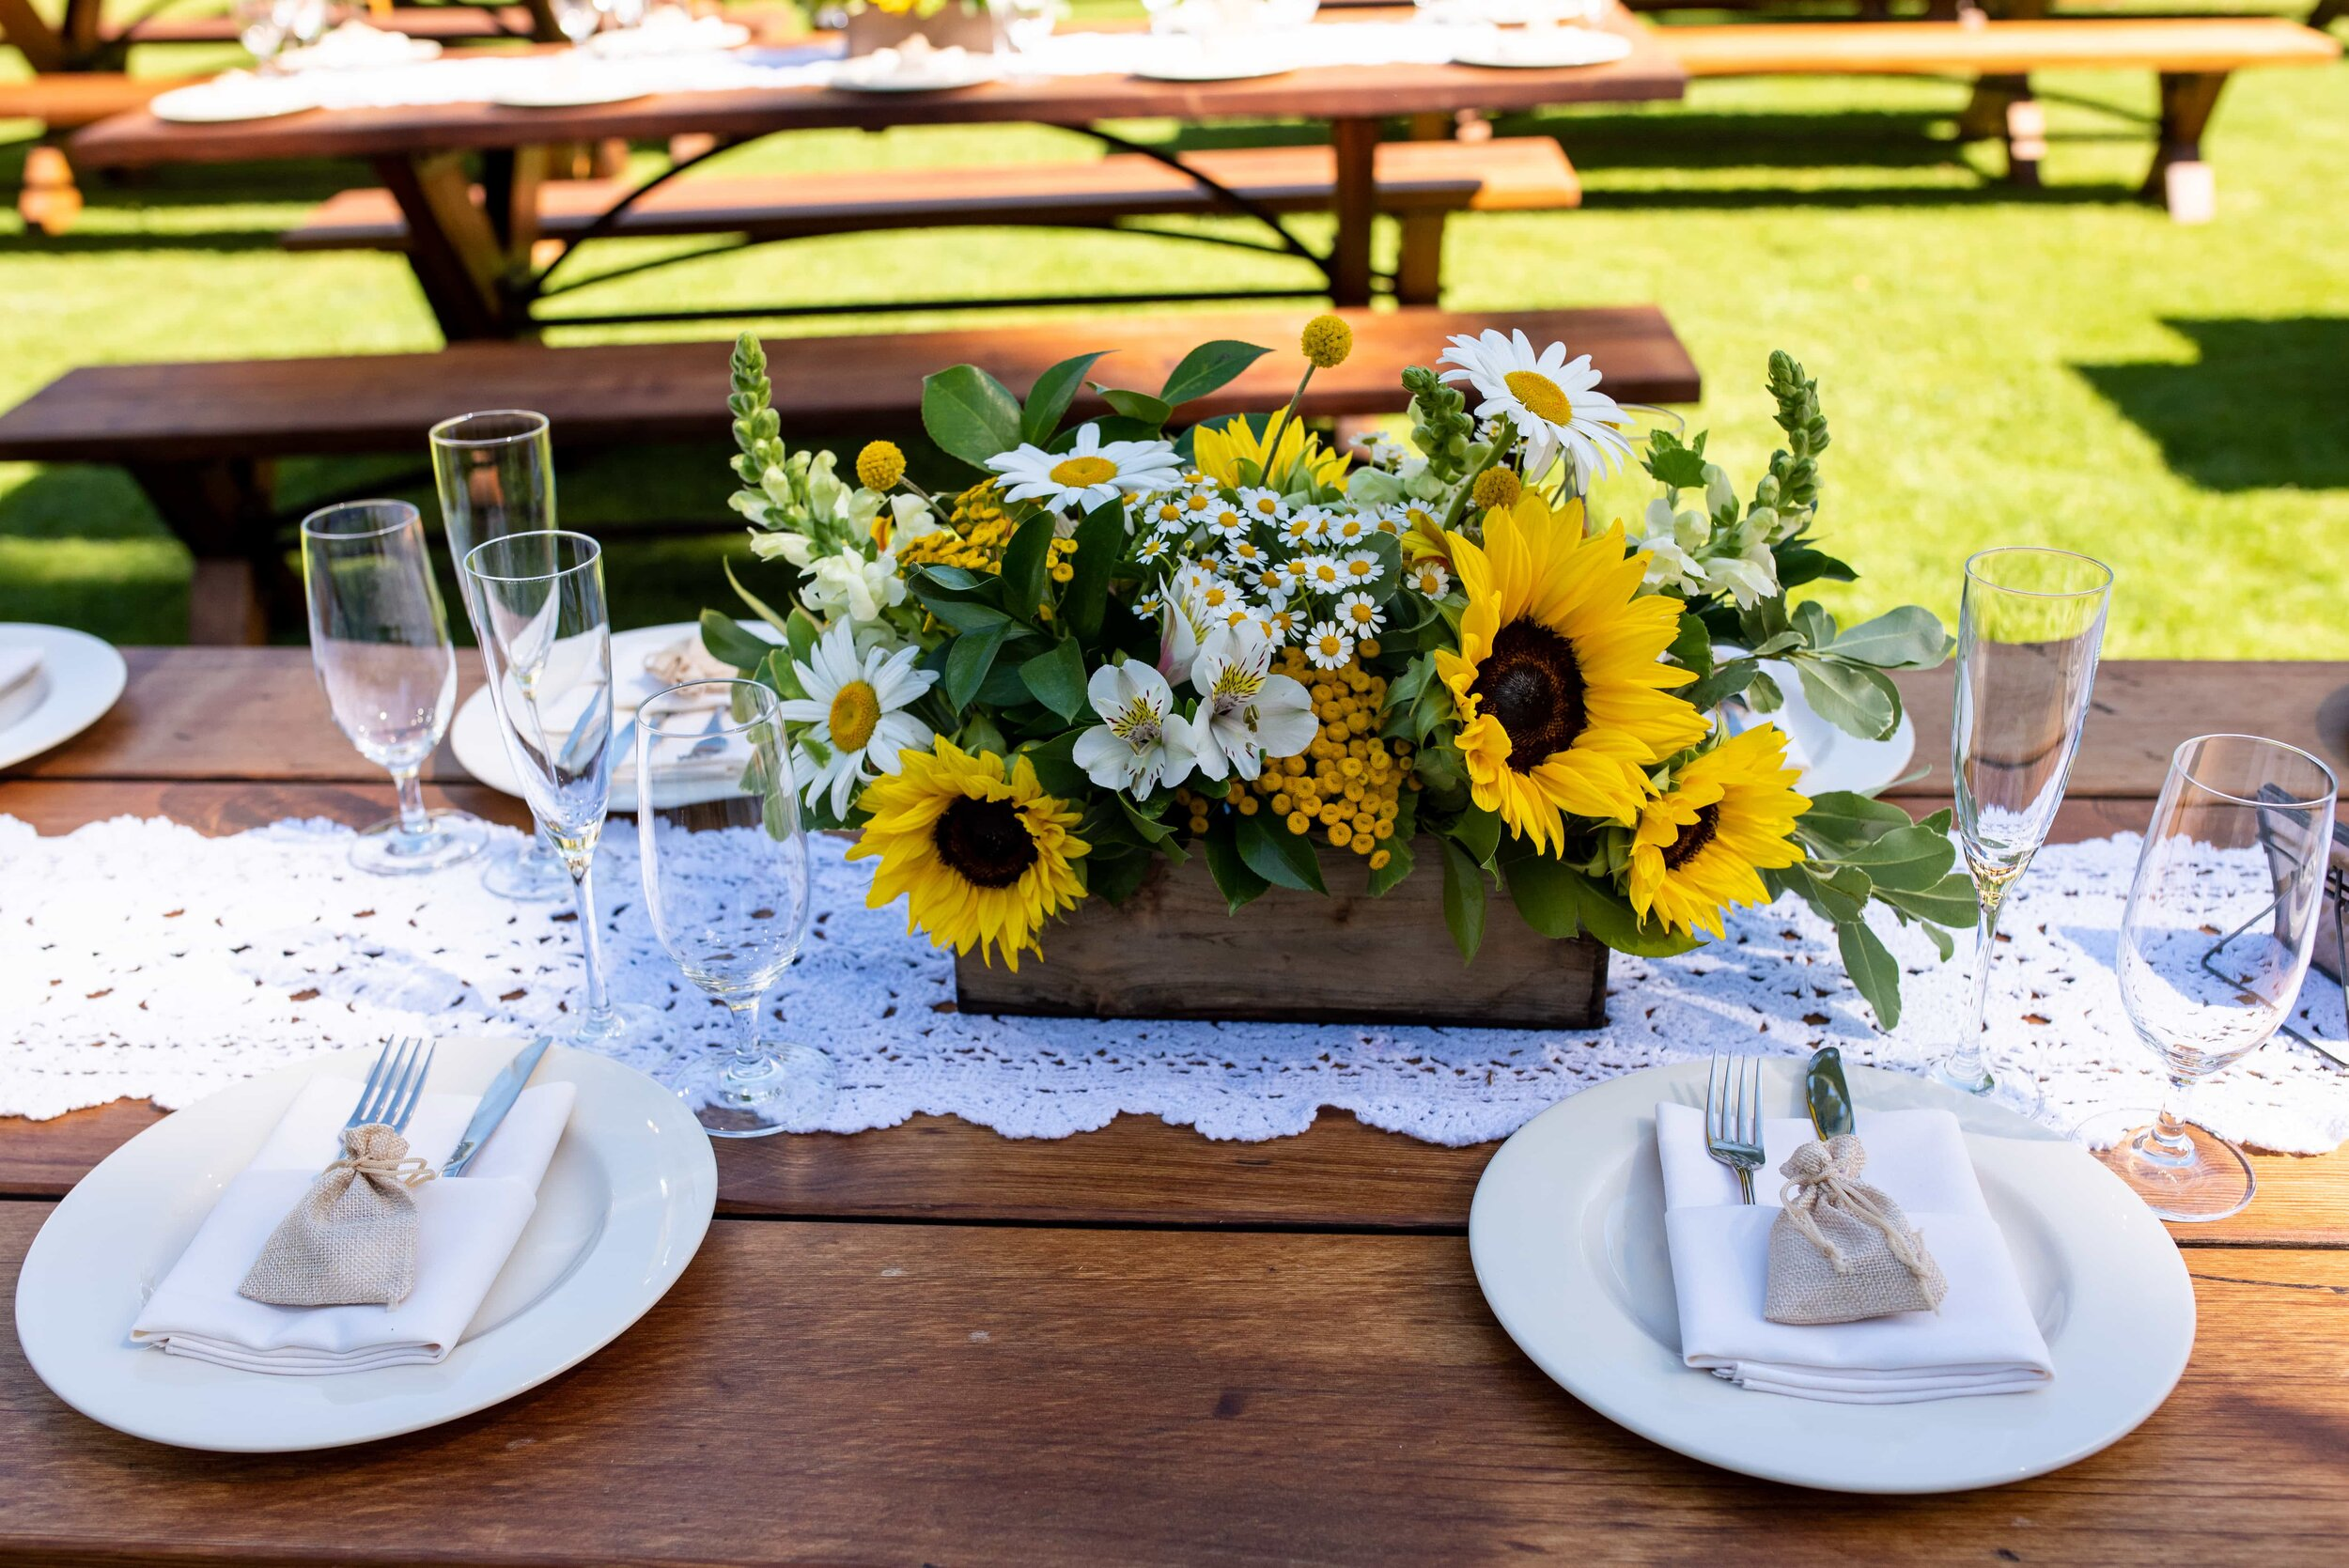 Sunflower center piece of wedding table